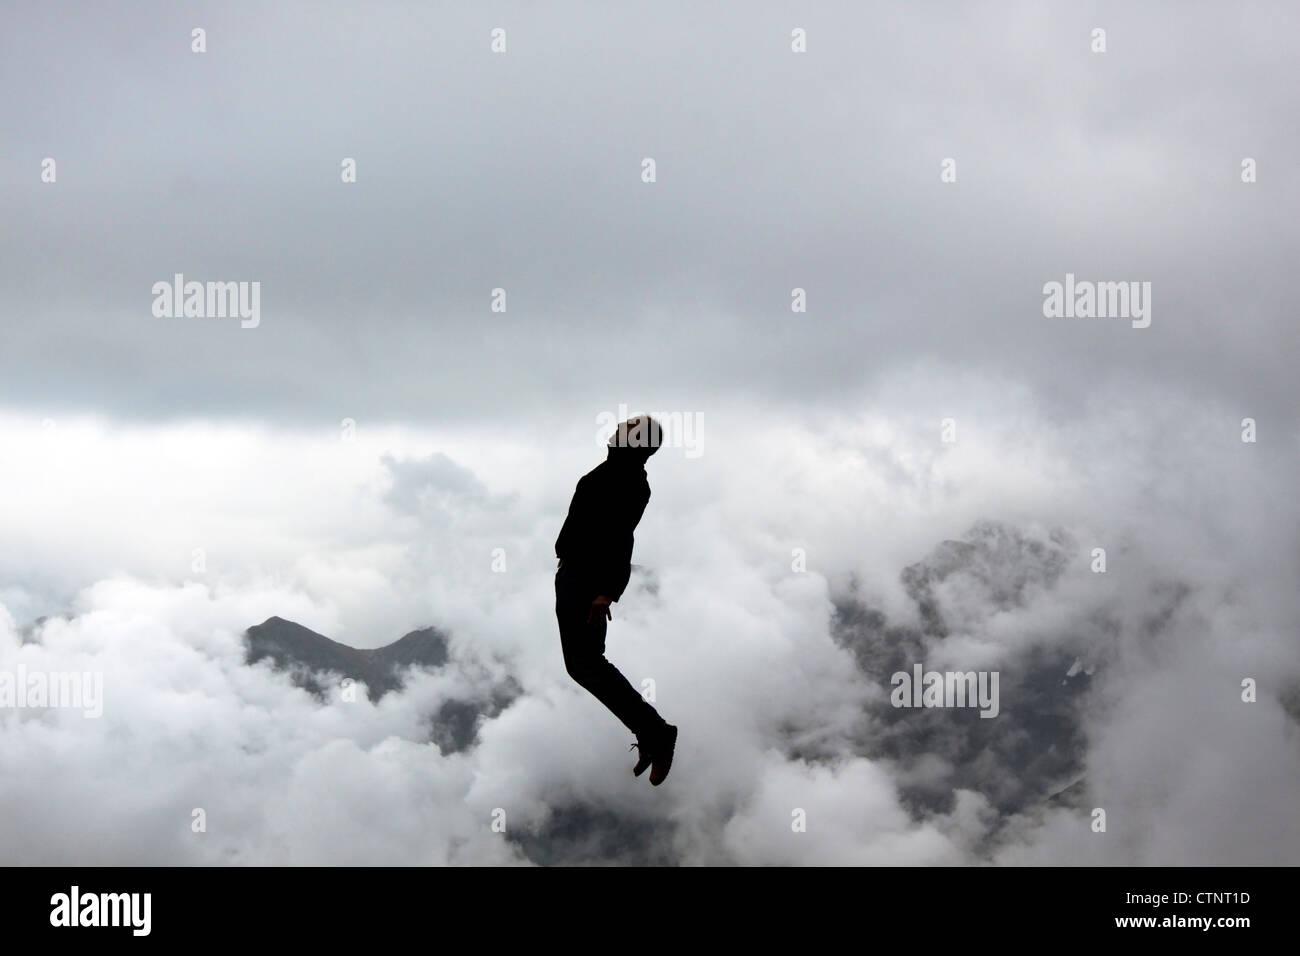 frozen jump - Stock Image